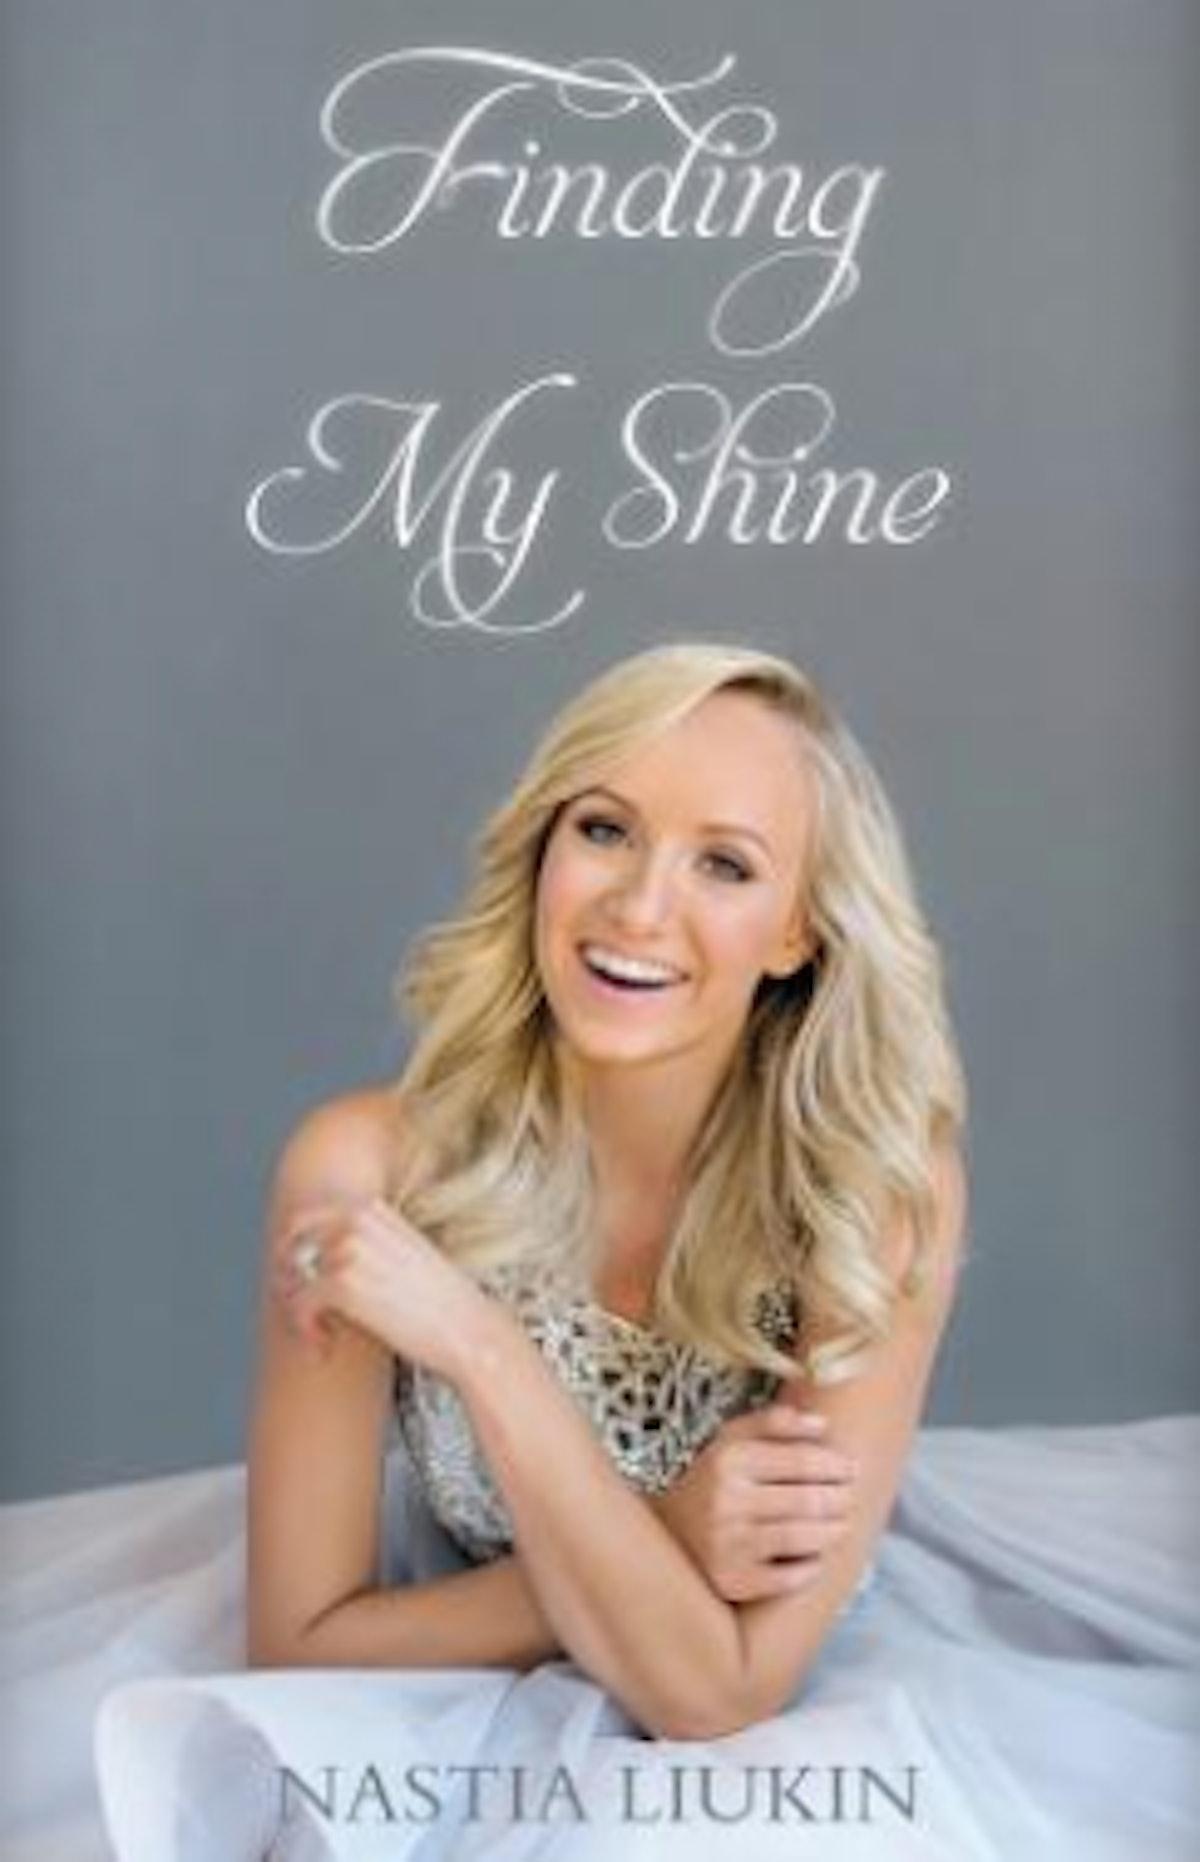 'Finding My Shine'